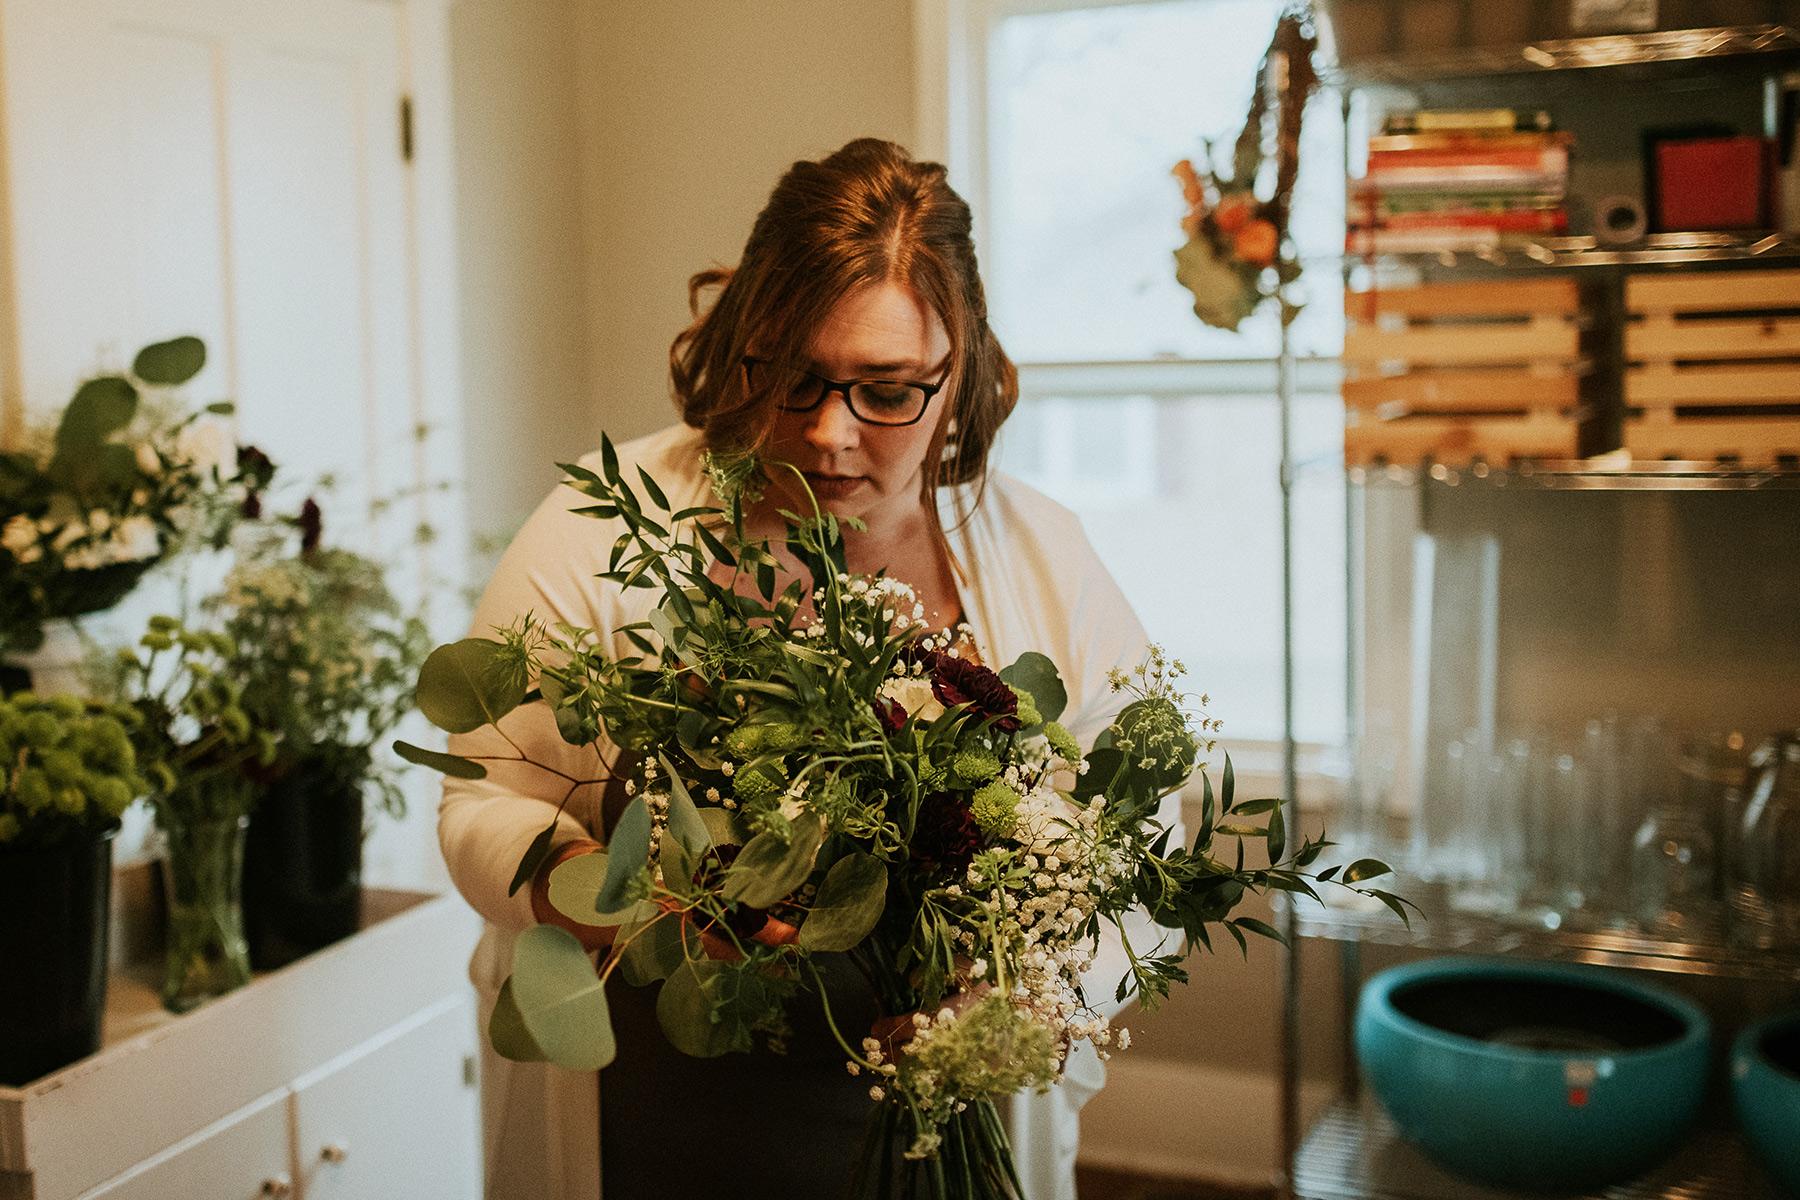 Sara adjusting bouquet